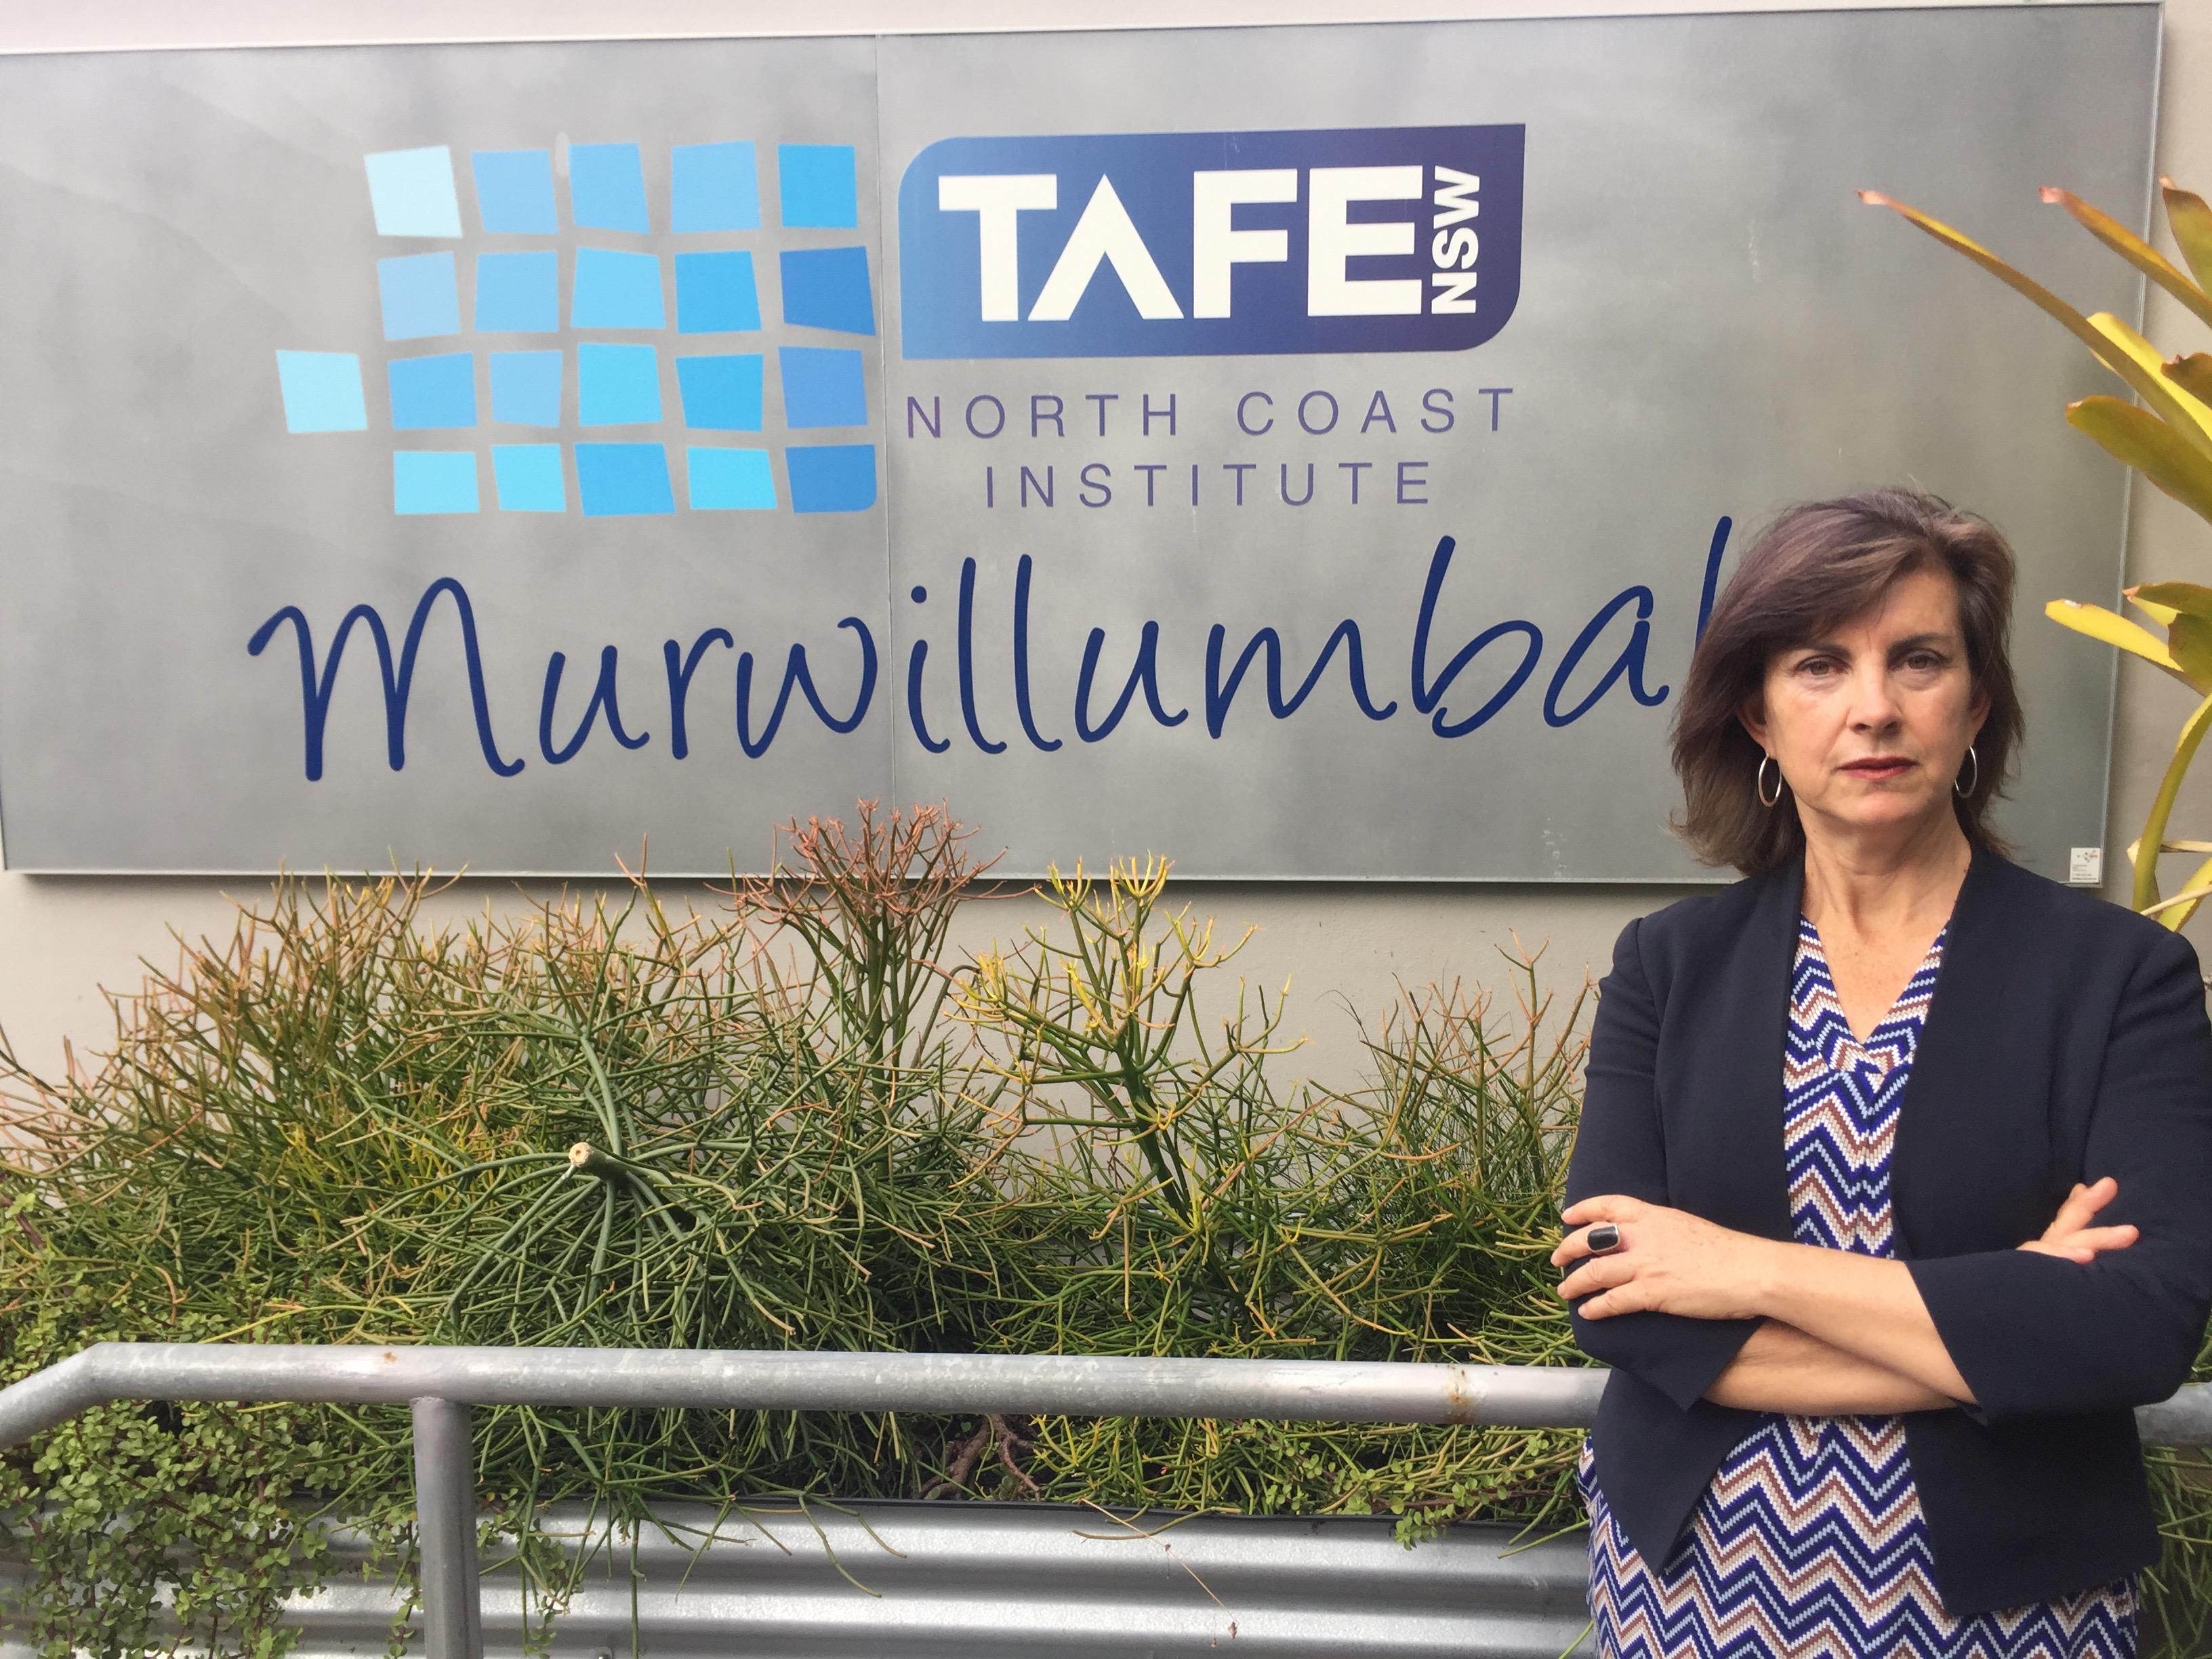 Save Murwillumbah TAFE! - Dawn Walker MP